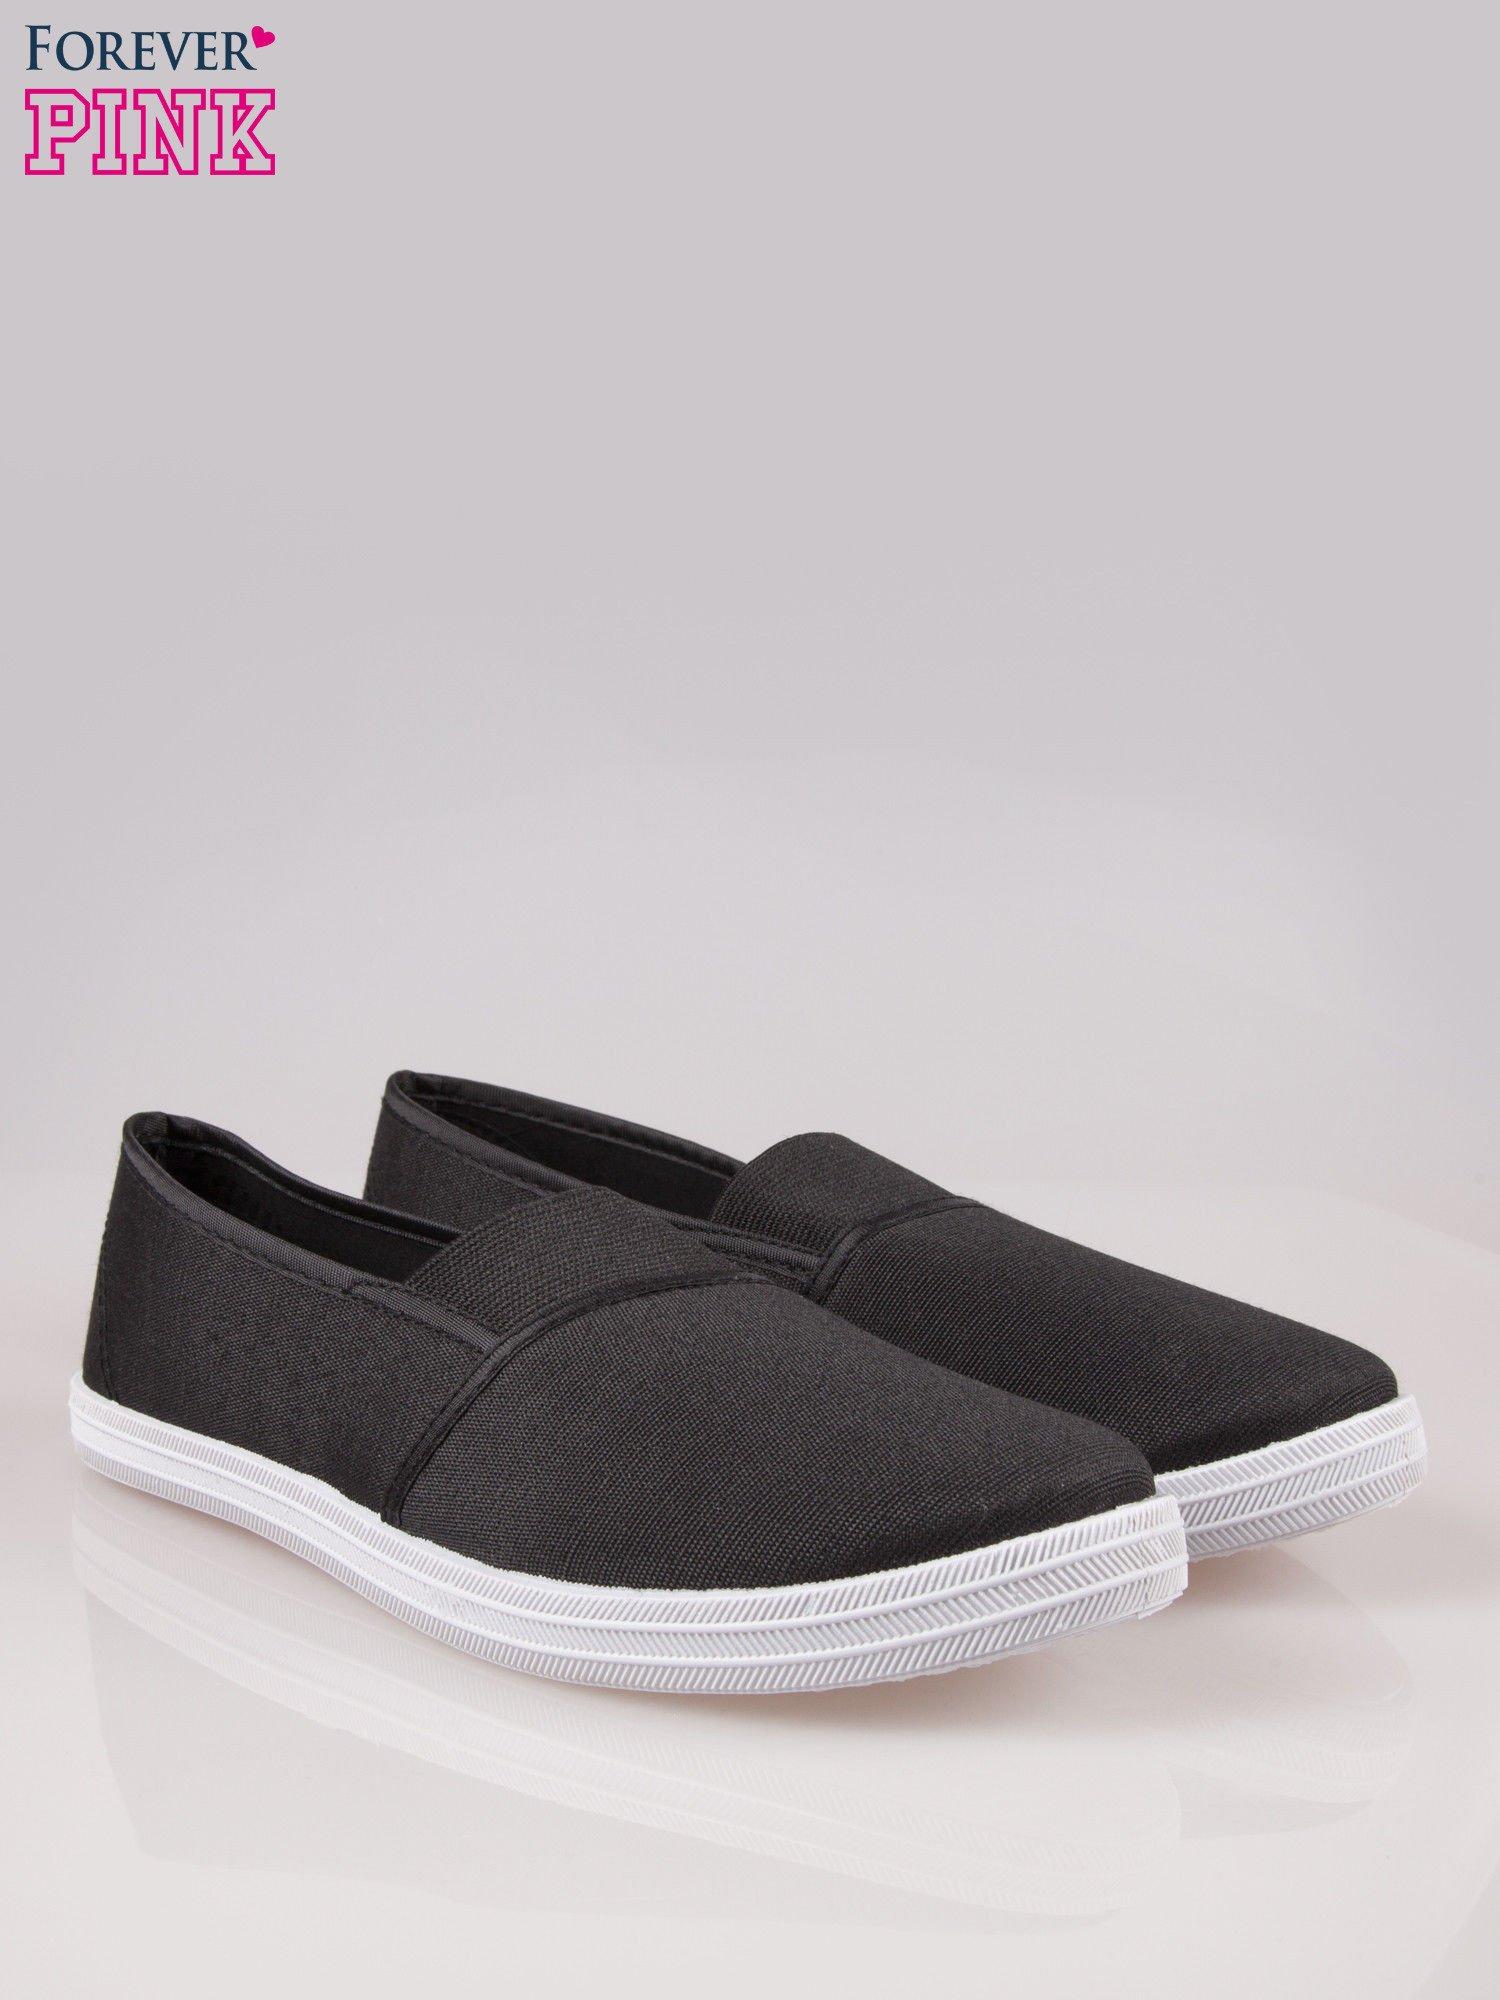 Czarne miękkie buty slip on                                  zdj.                                  2